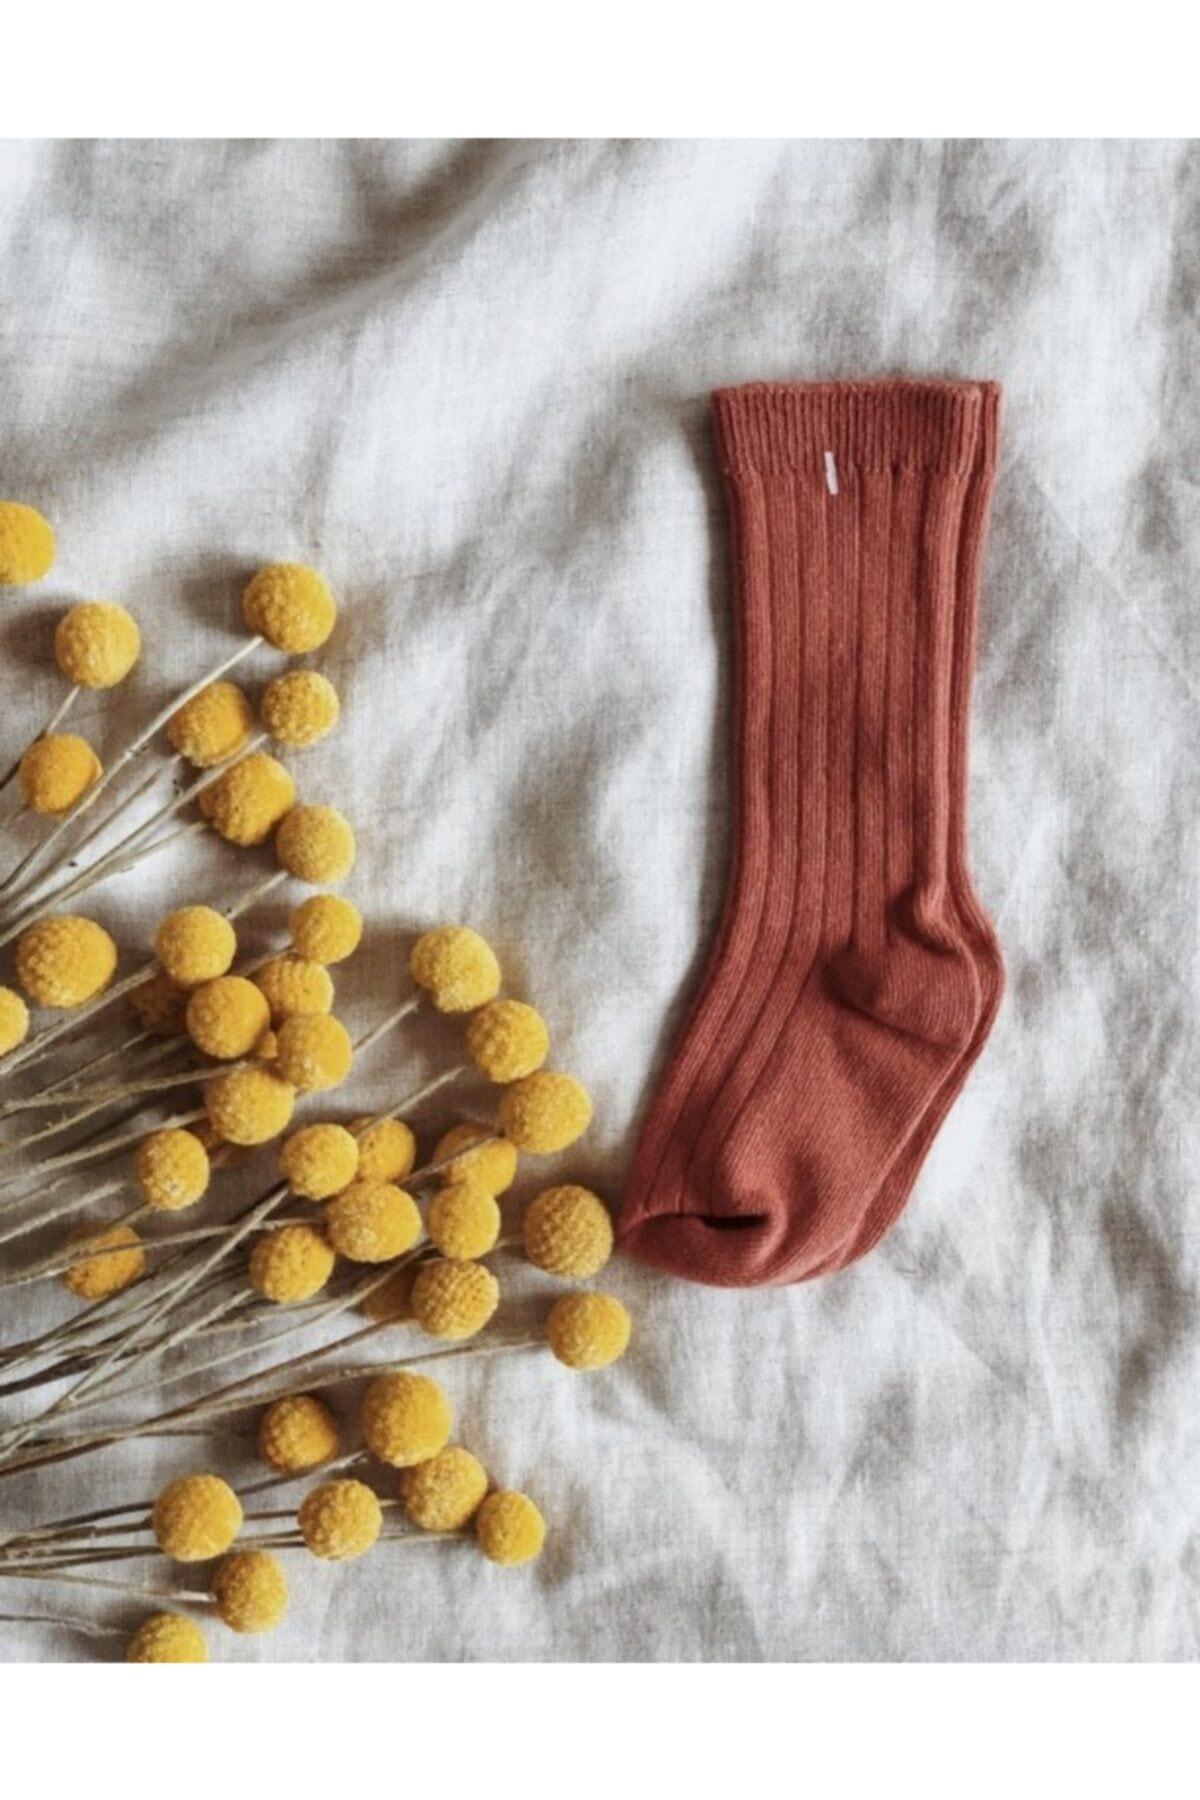 LAL Babyrompers Unisex Bebek Kiremit Soft Çorap 1